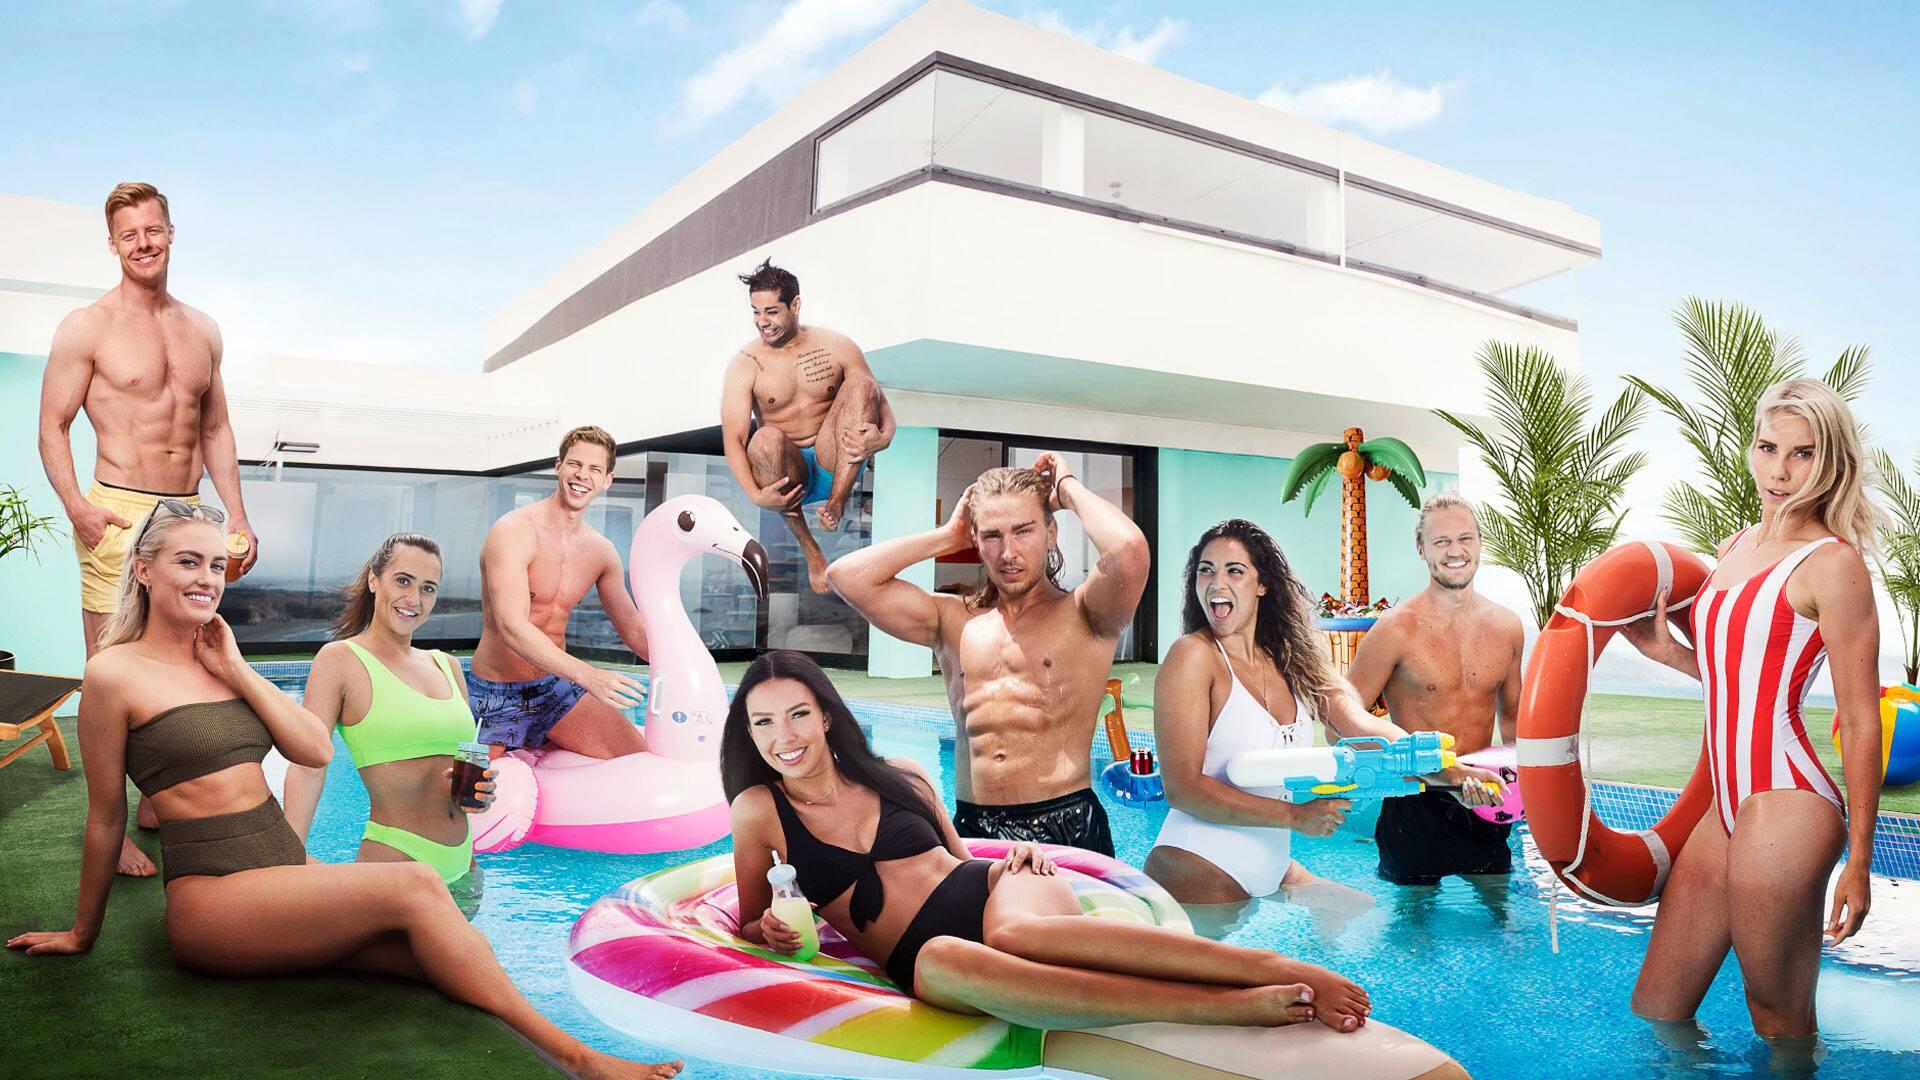 bikini island viaplay